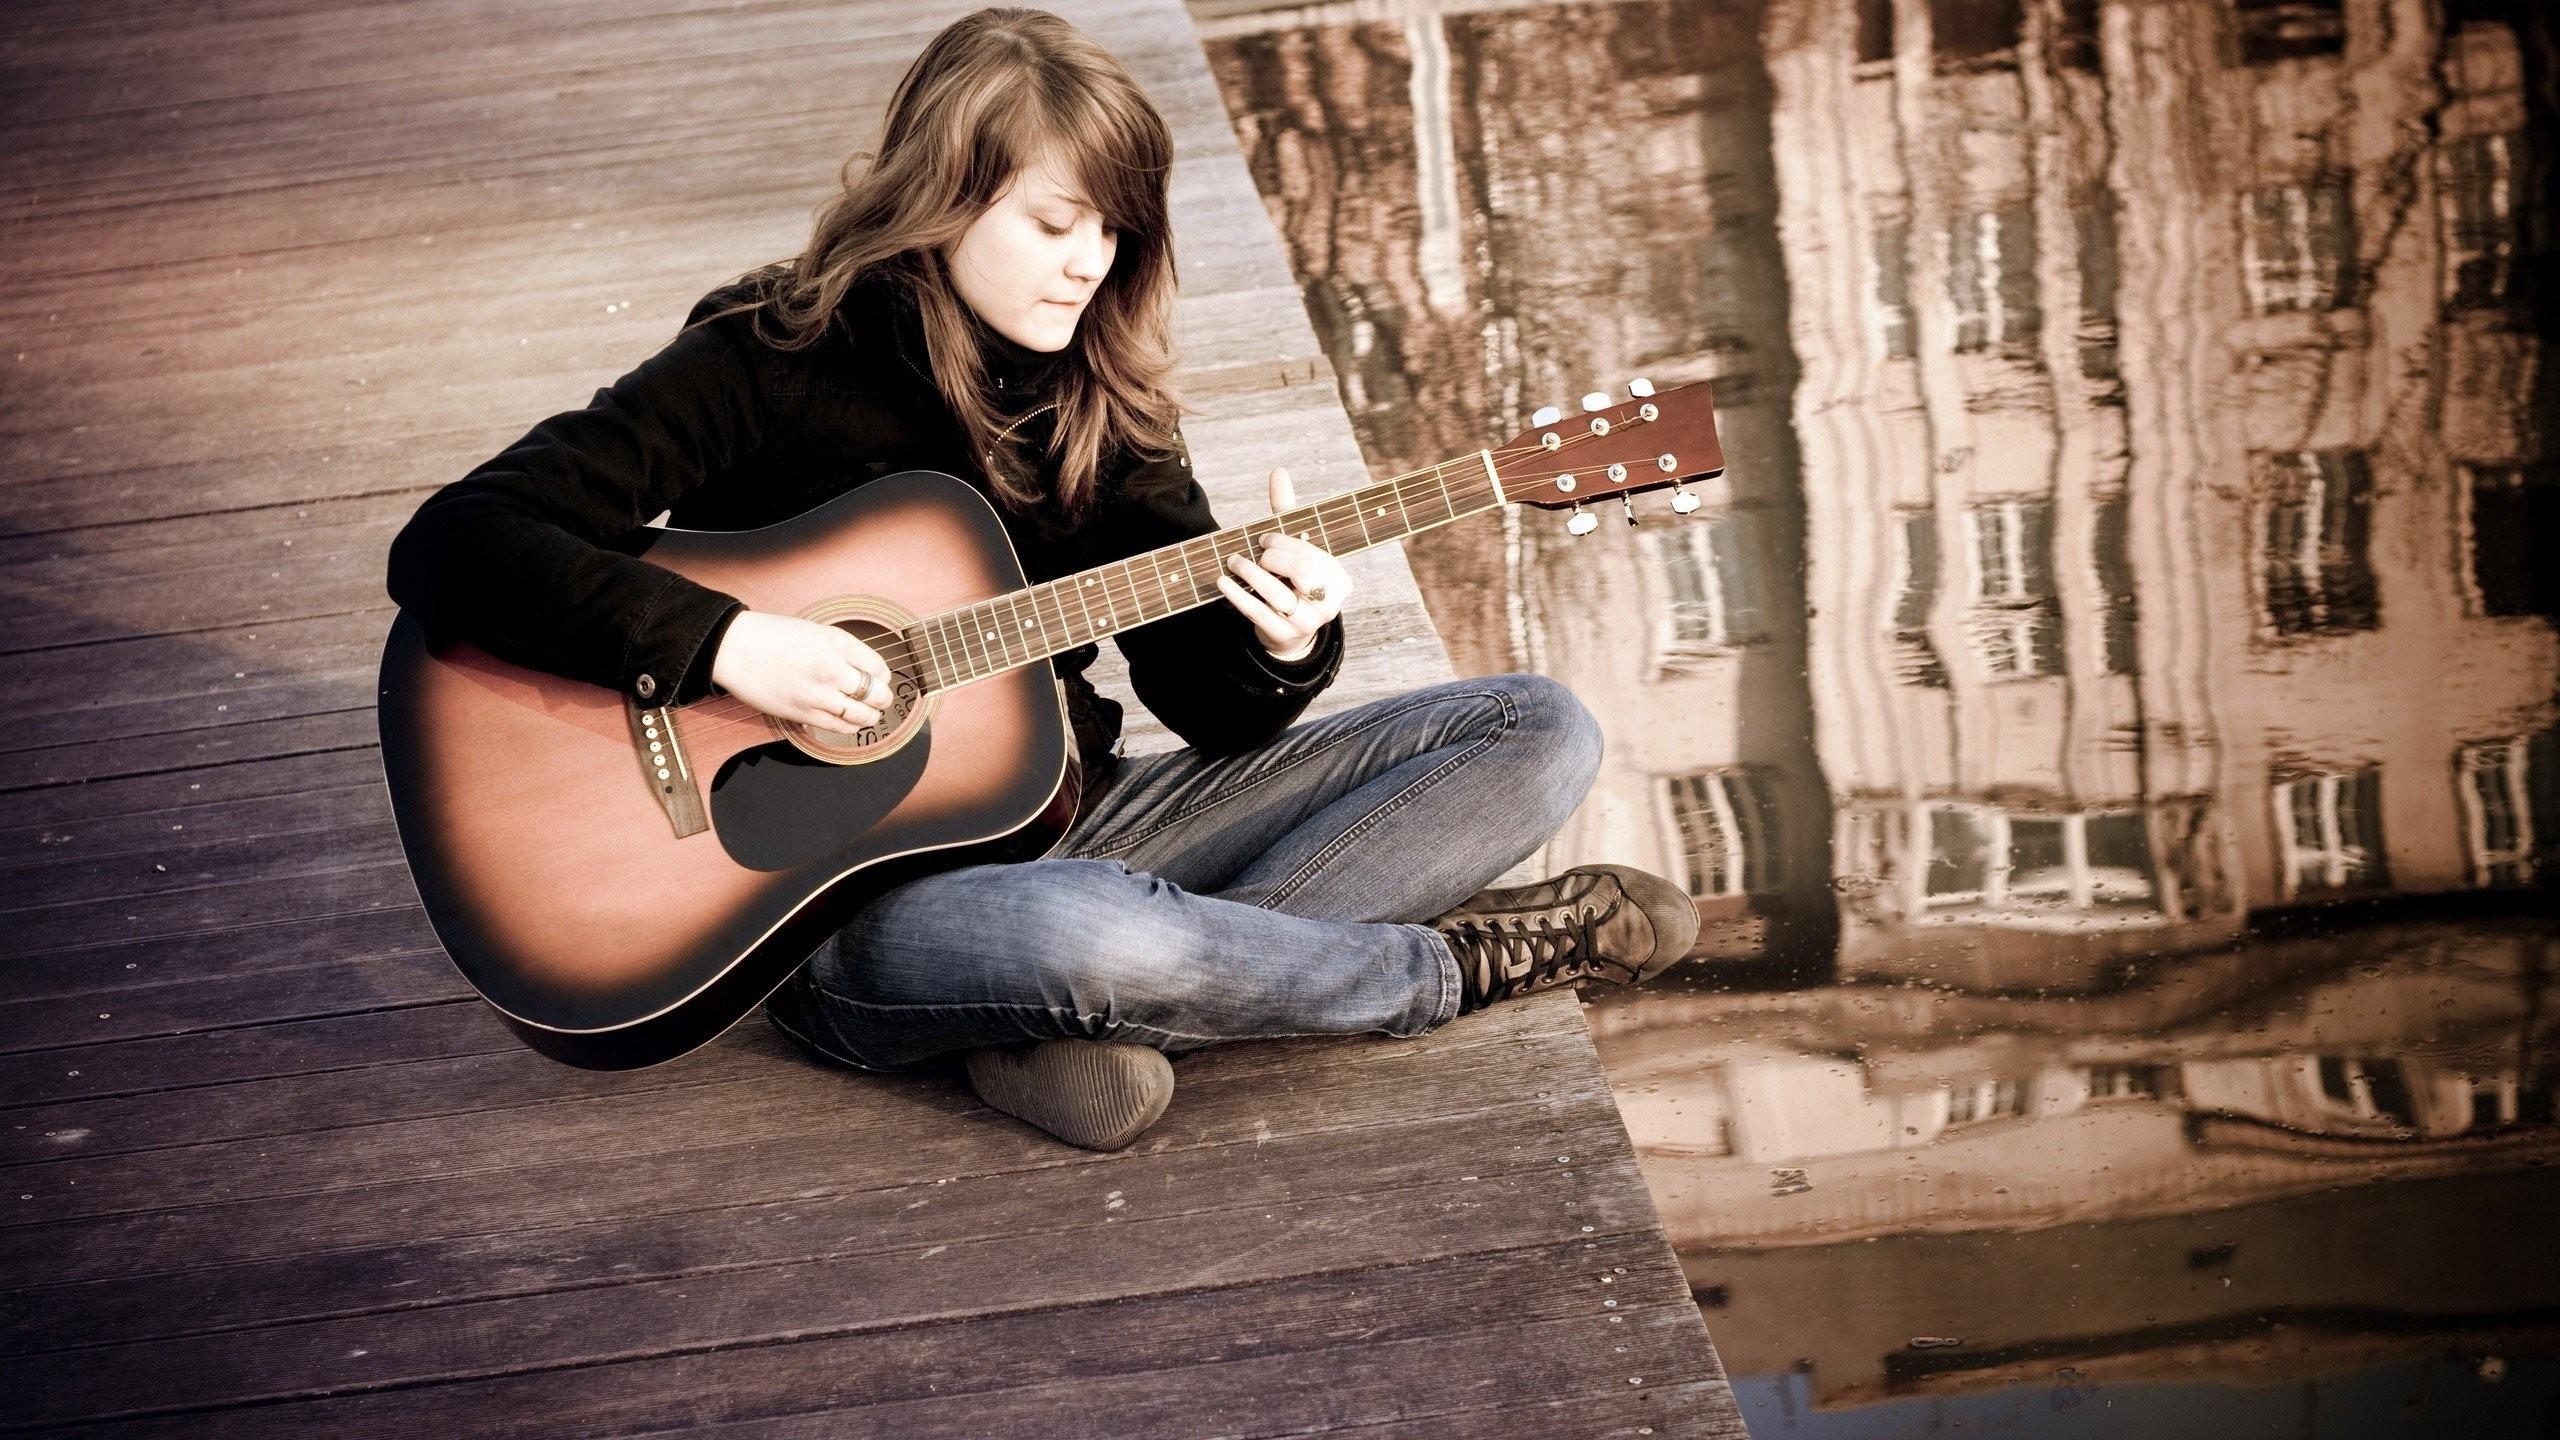 Res: 2560x1440, Brunettes women jeans acoustic guitars guitars rooftops Diego Rivera  wallpaper |  | 309305 | WallpaperUP